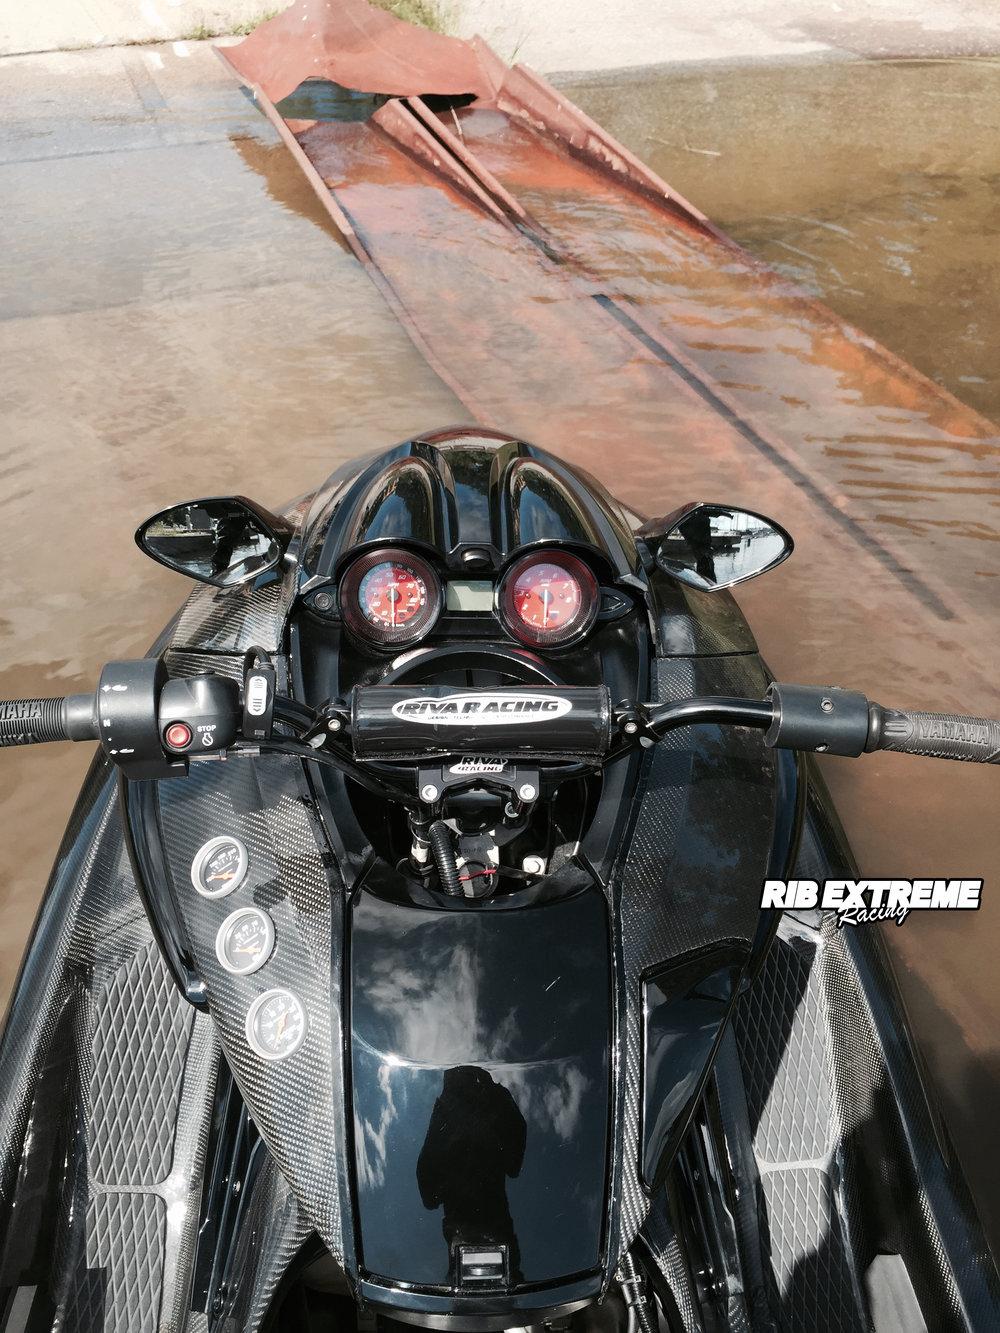 Yamaha FZR TURBO (Nero) - 500 hk